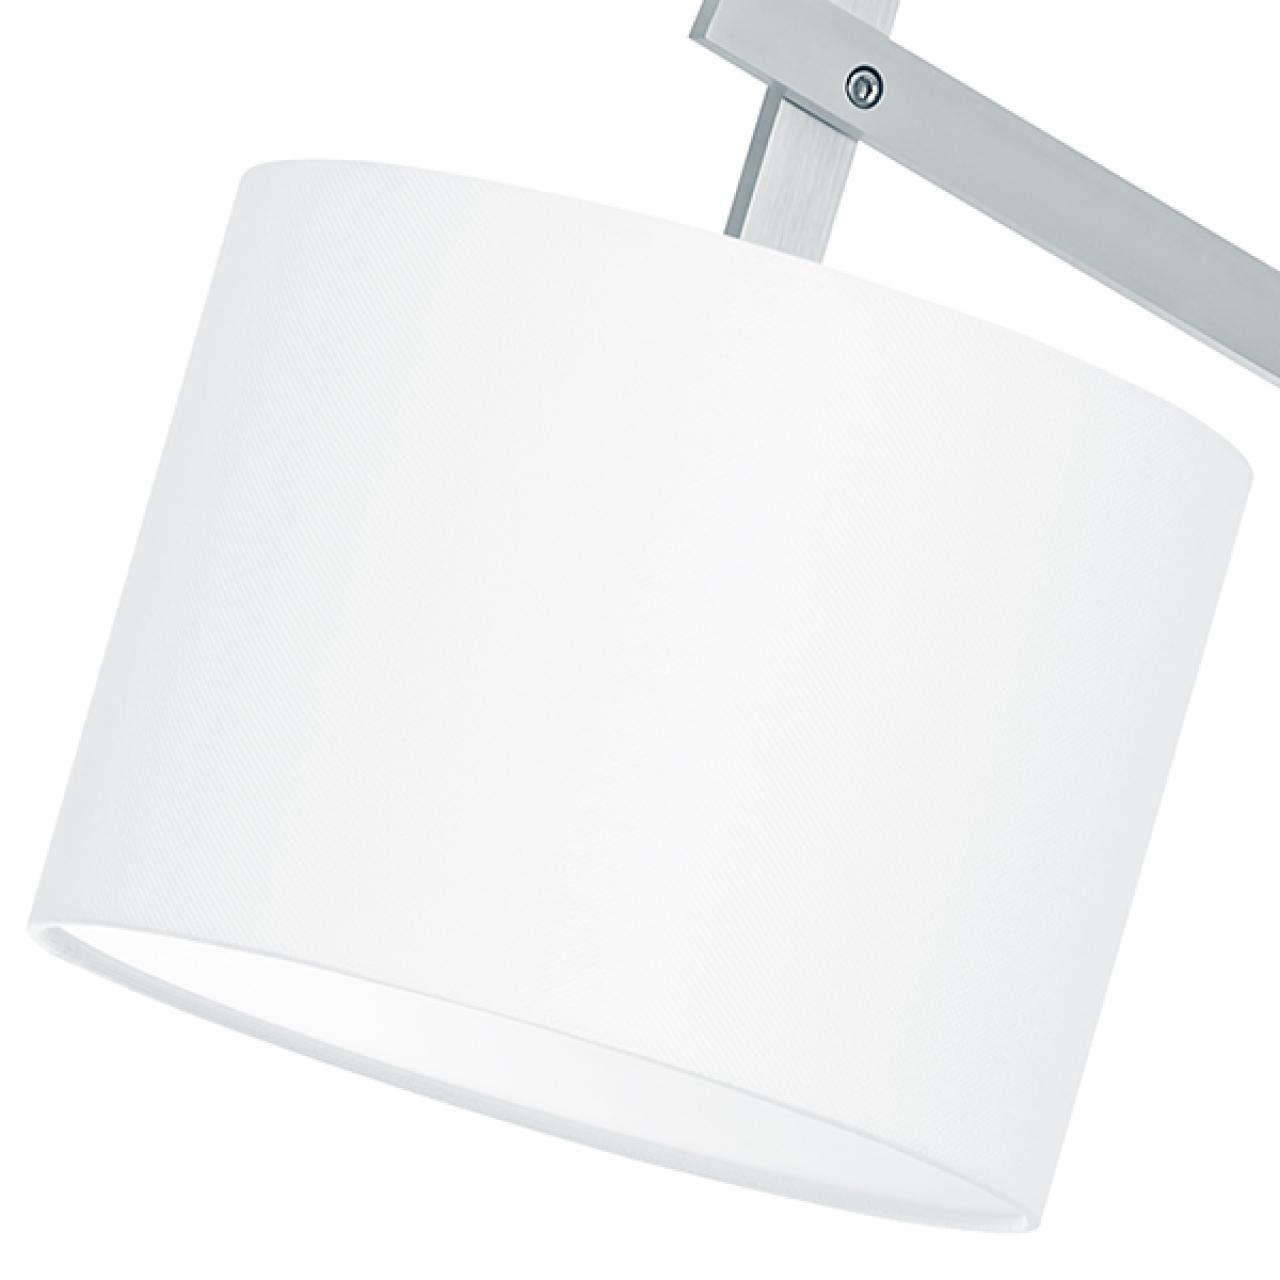 Торшер MECCANO 1х60W E27 хром / белый ткань Lightstar 766719